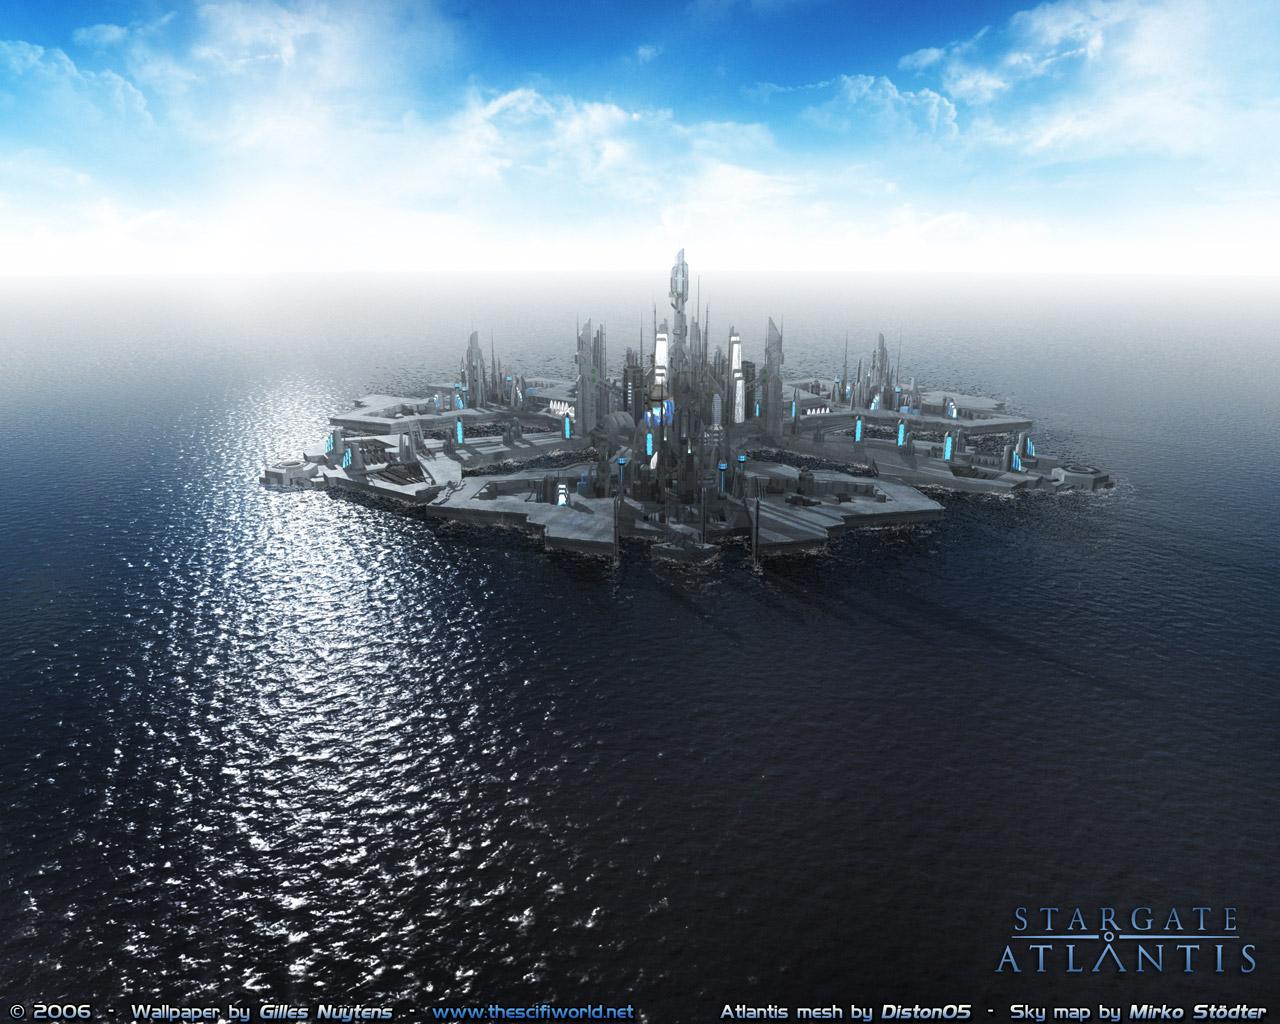 http://2.bp.blogspot.com/-_v_Exe_3r3I/TtzQ0ABzEvI/AAAAAAAAAr4/DBZbo9zkiYA/s1600/stargate-atlantis-hd-4-724787.jpg